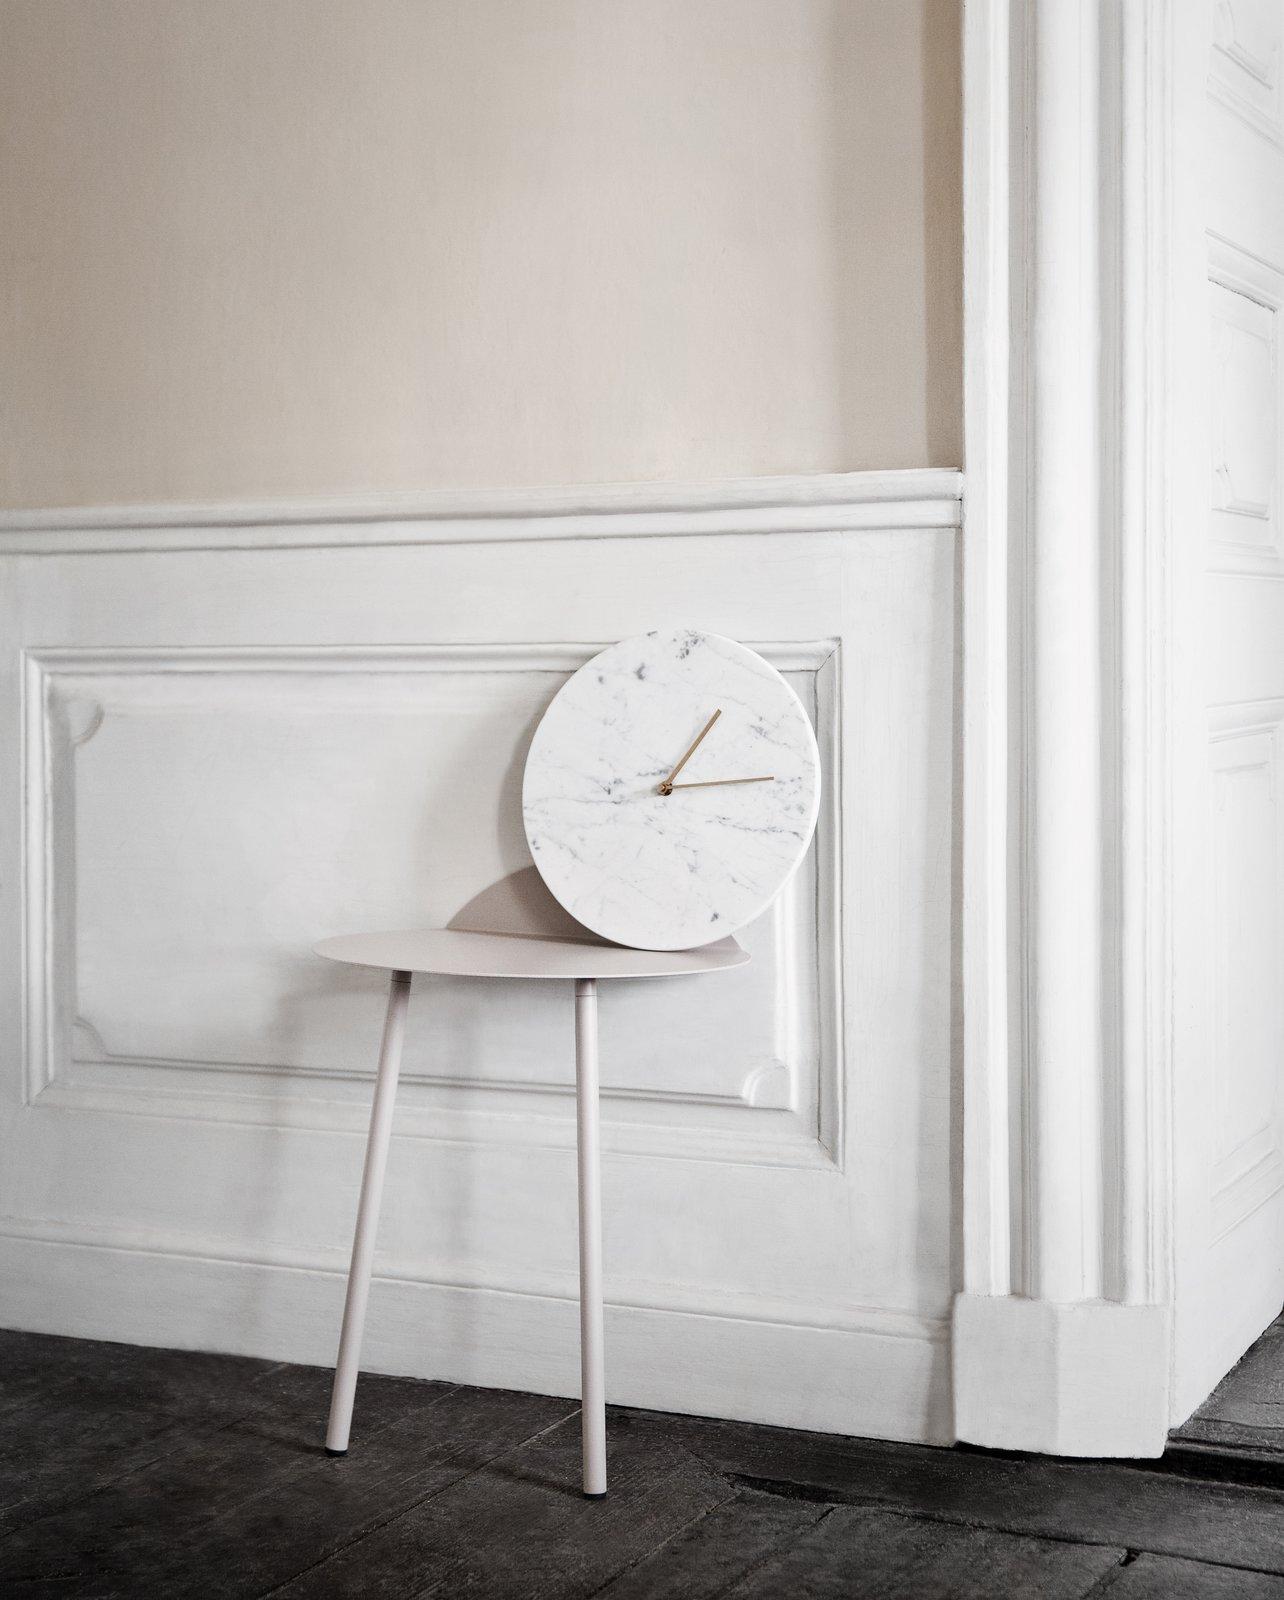 Photo 1 of 1 in Menu Marble Wall Clock